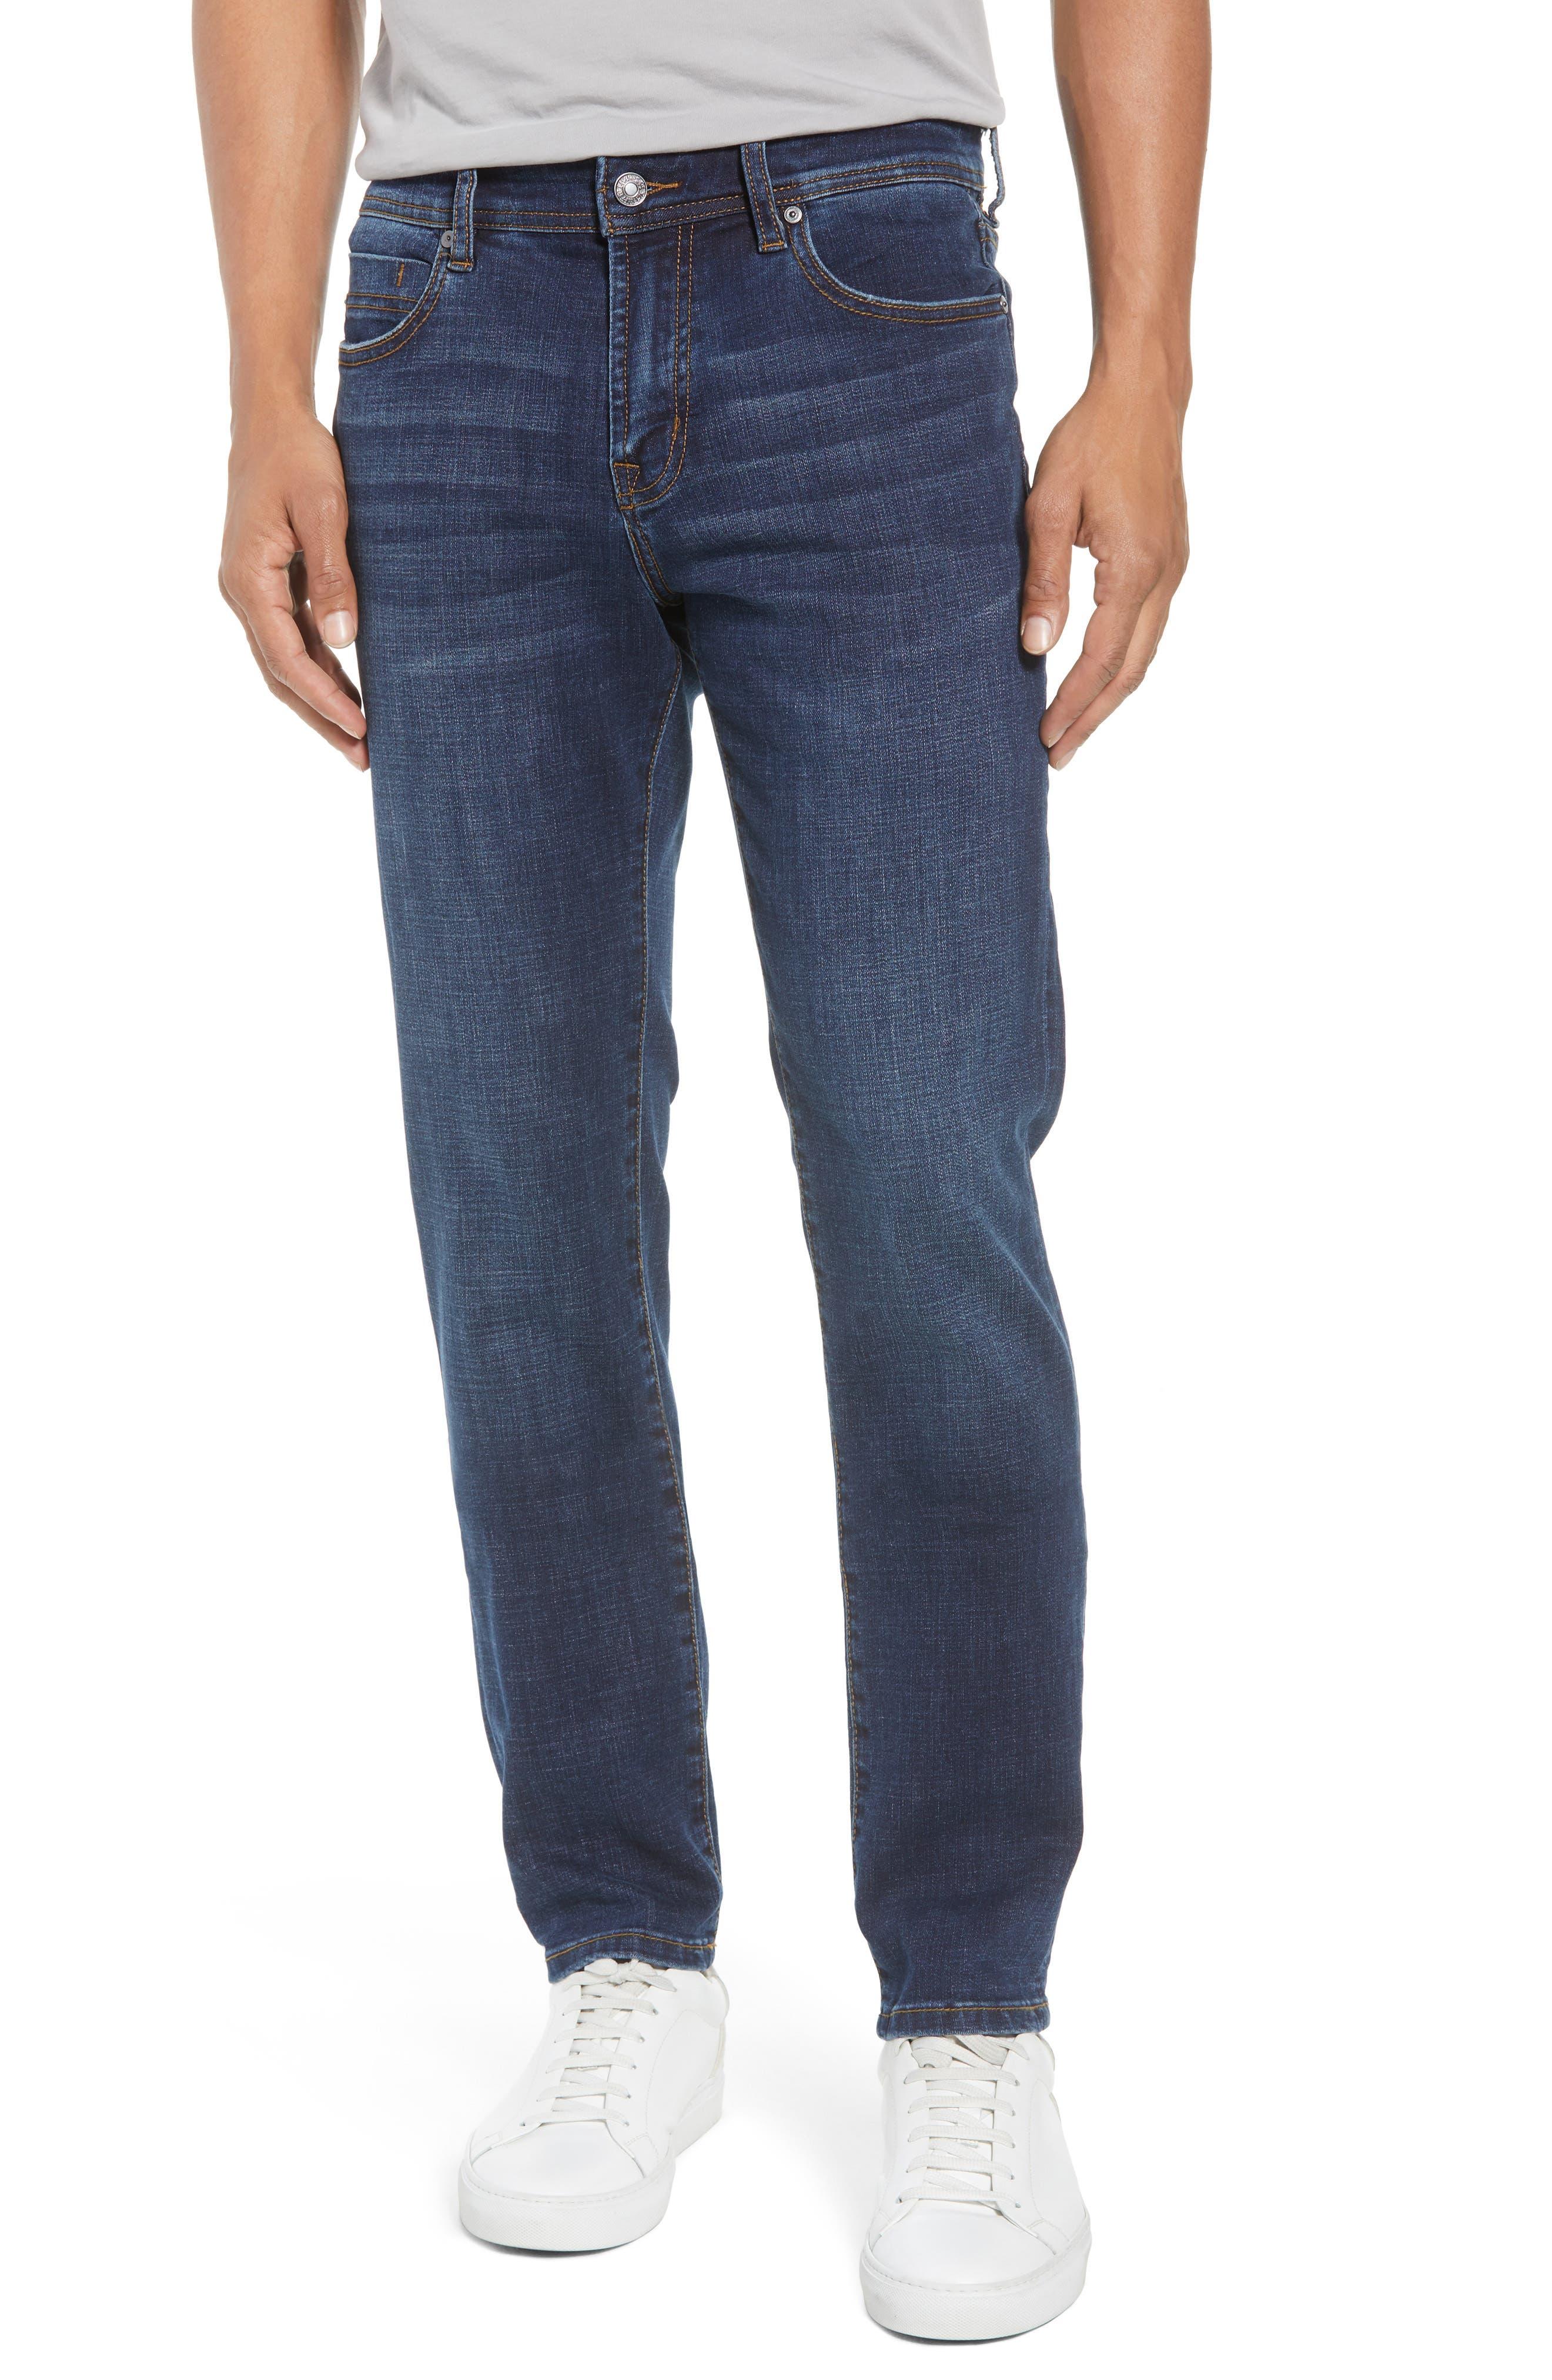 Image of Liverpool Jeans Co Kingston Slim Straight Leg Jeans